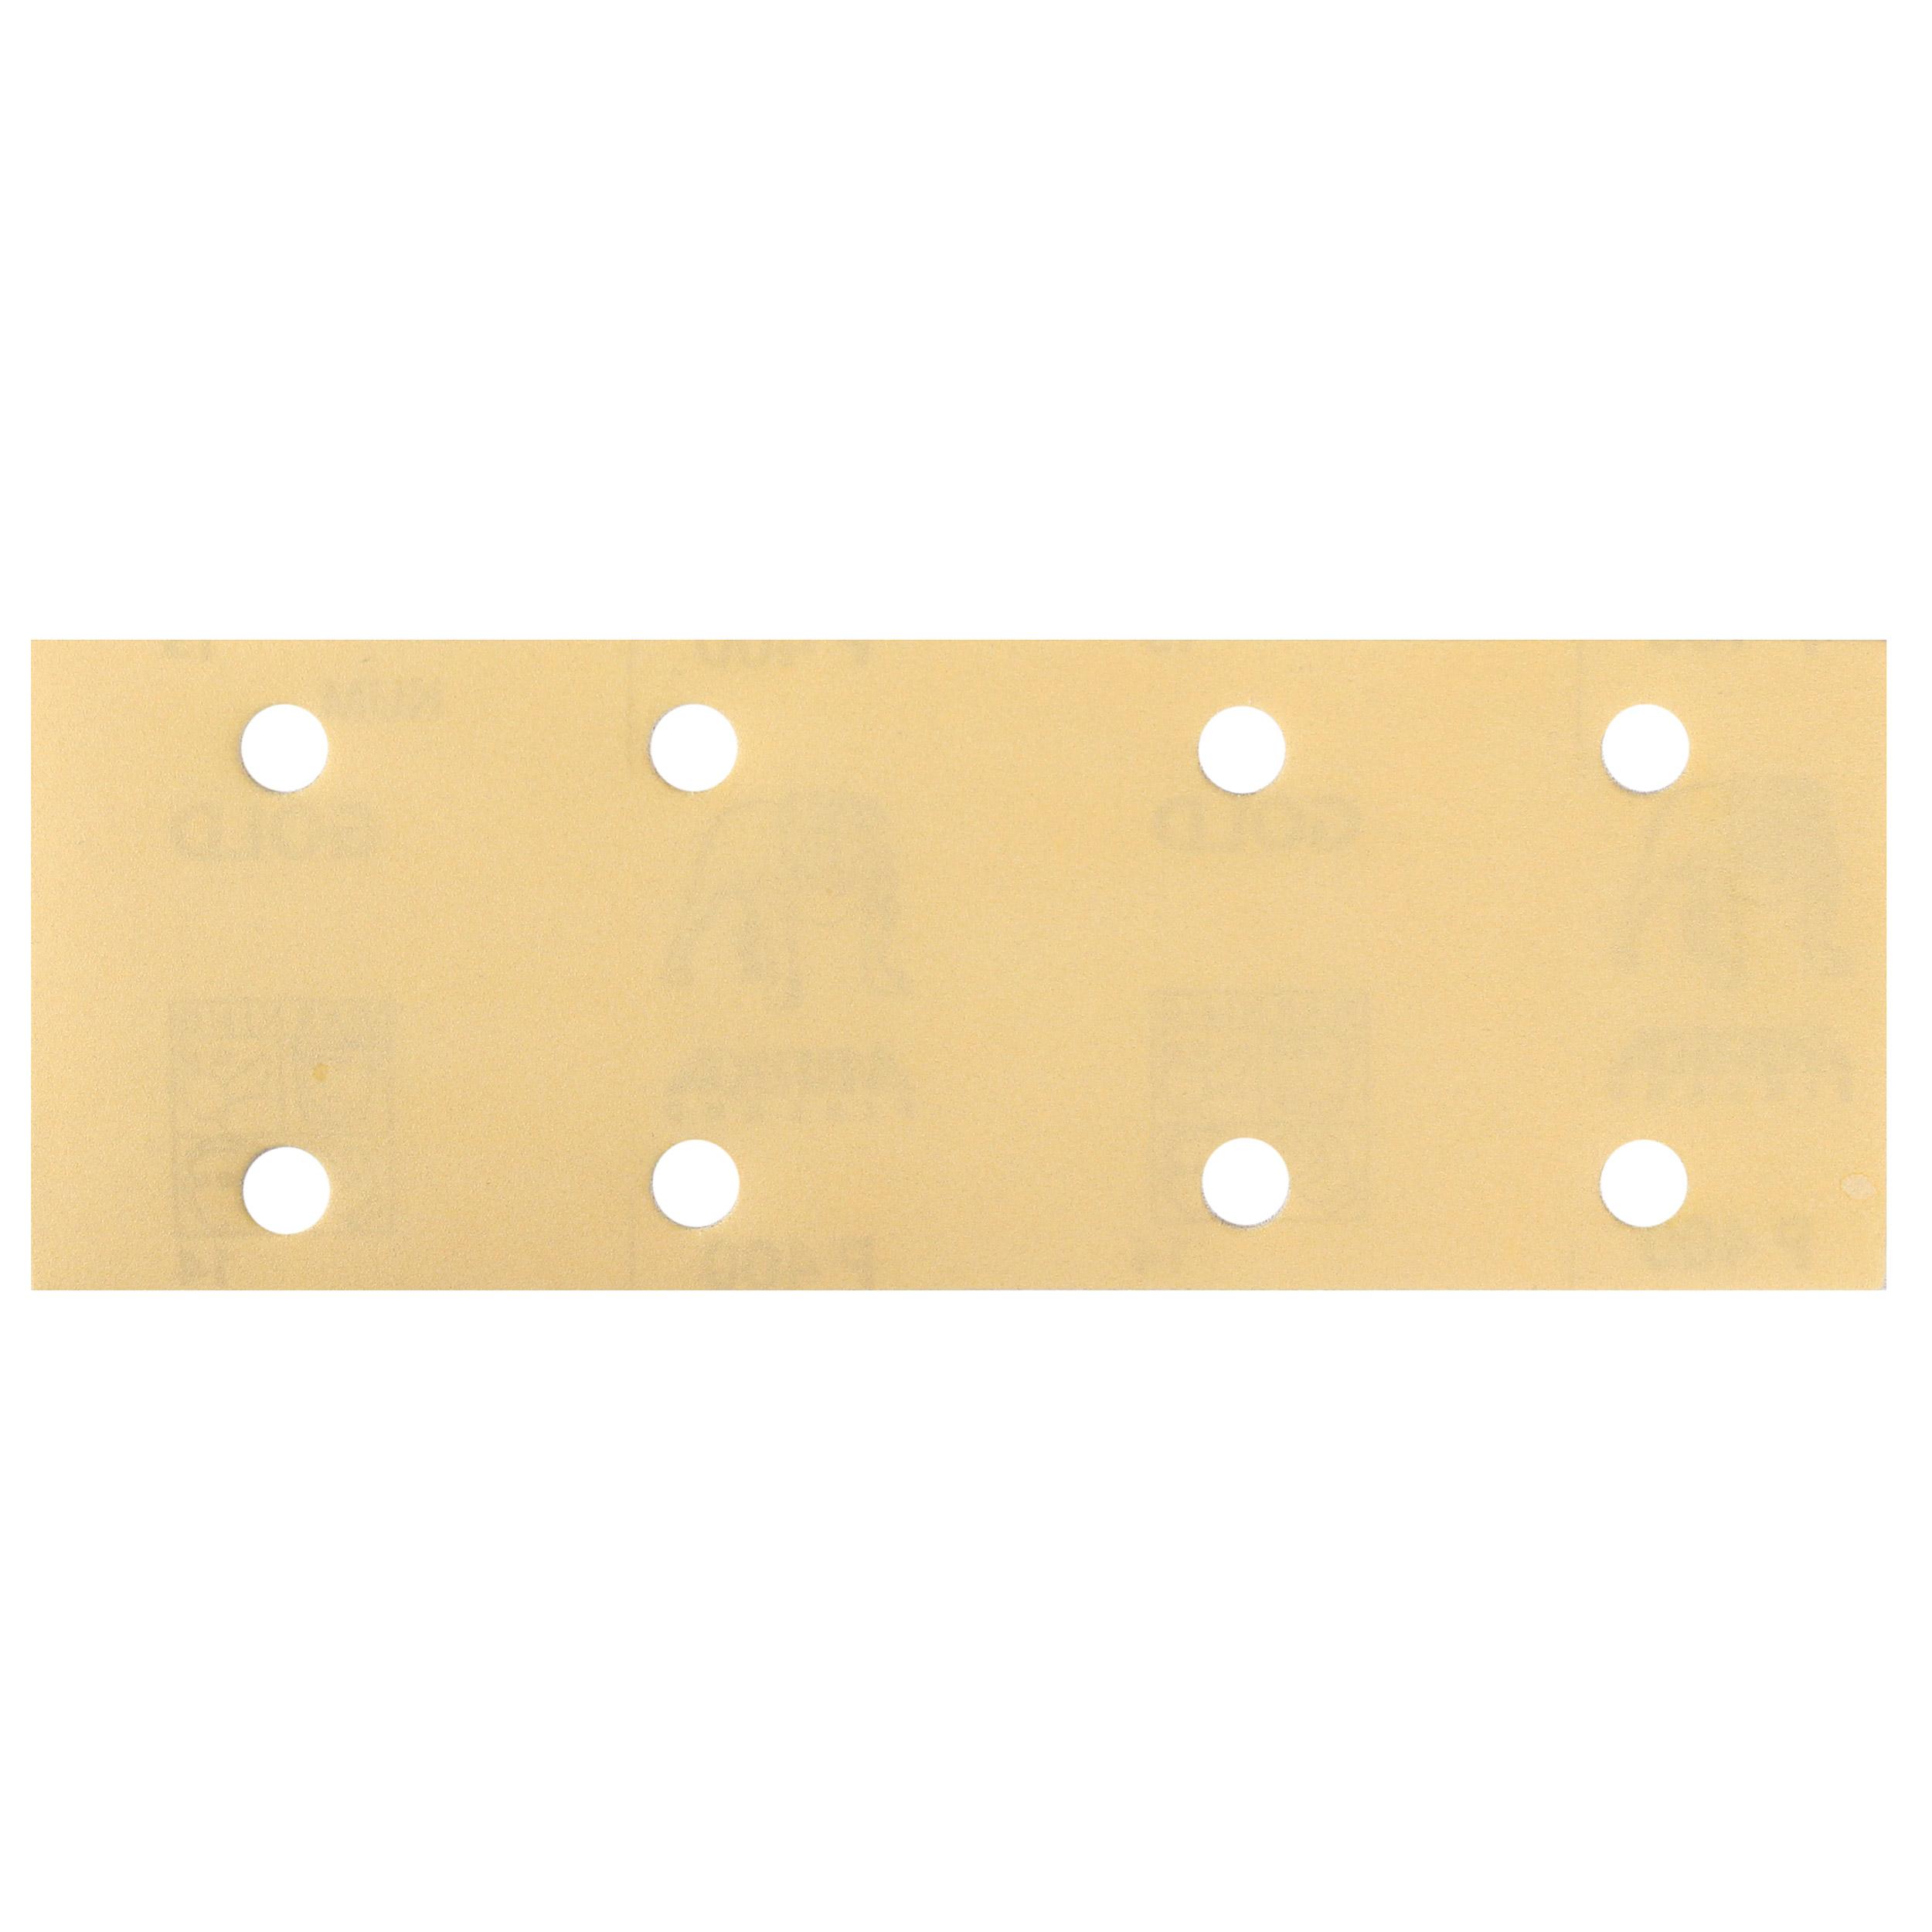 "GOLD 2.75x8"" Grip Sandpaper, 8H P120, 50 Sheets/Box"